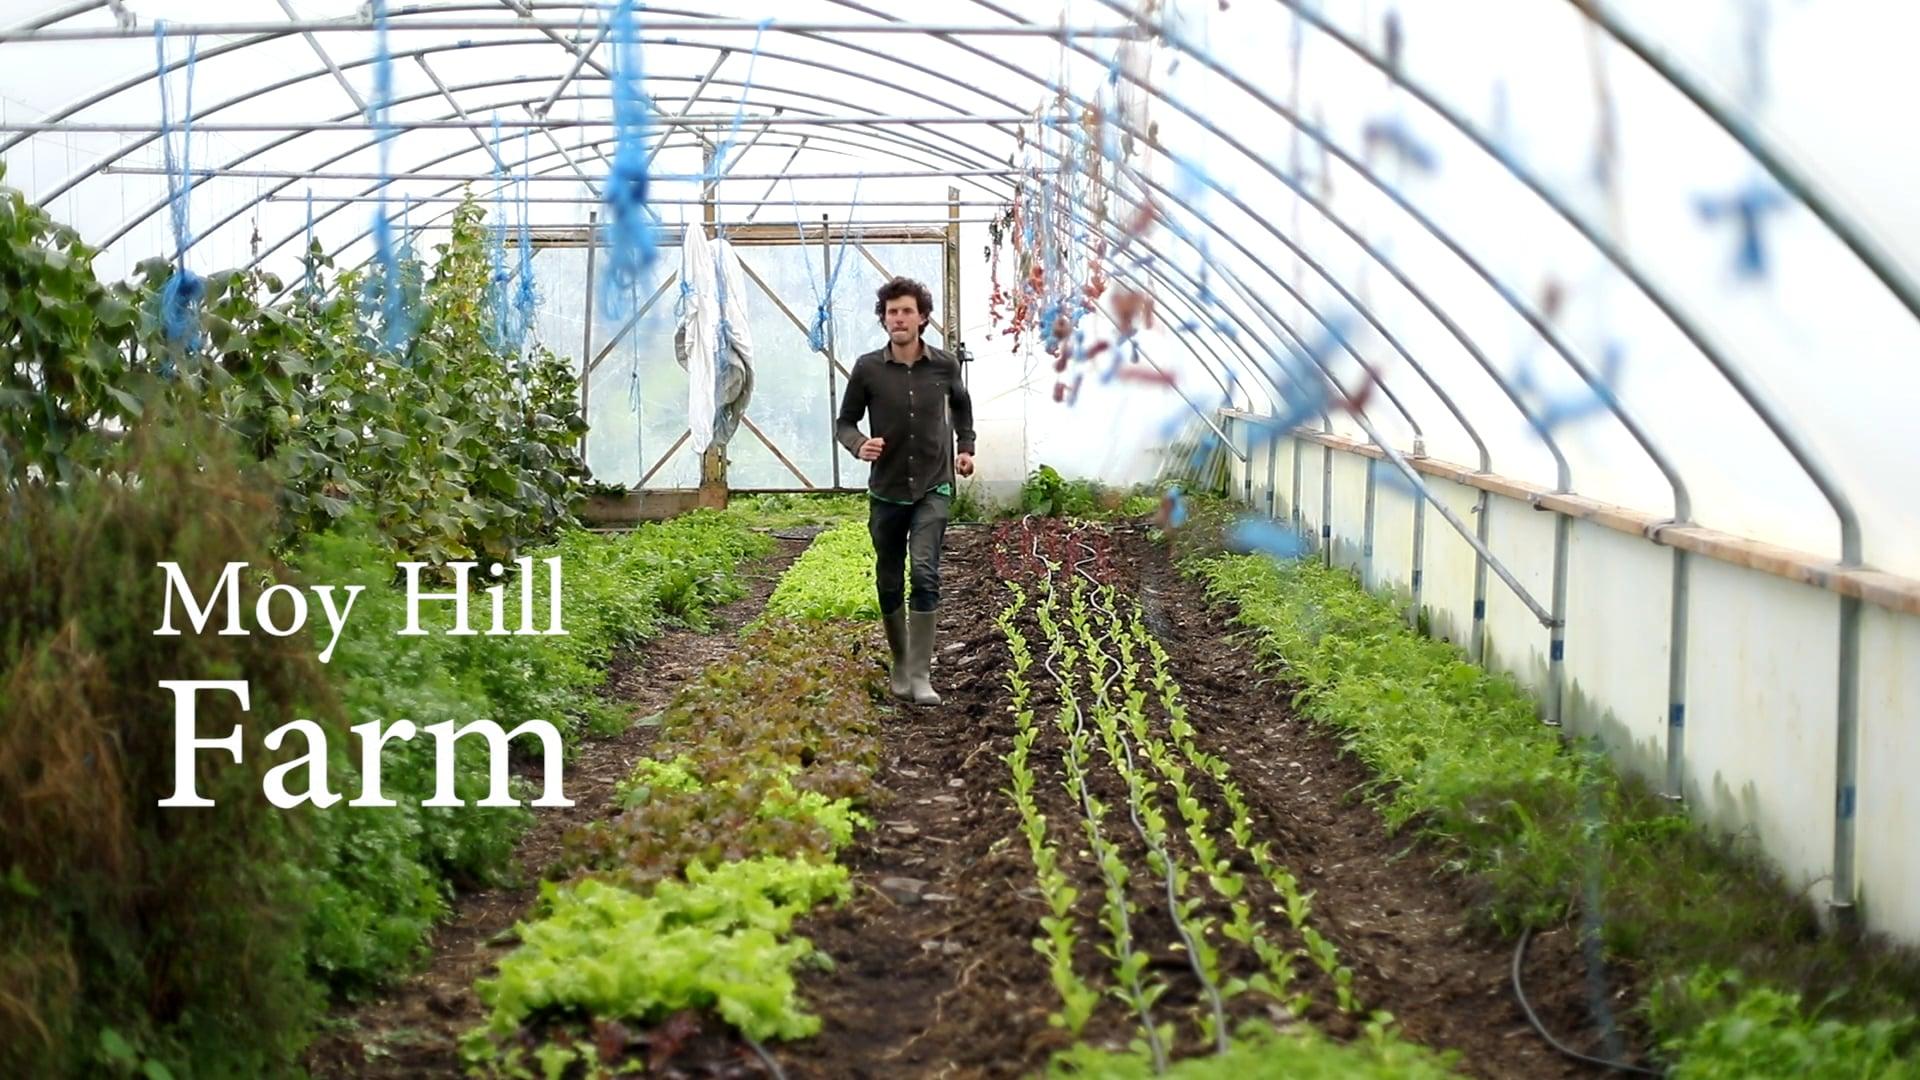 Moy Hill Farm - Part of the Irish Seed Savers